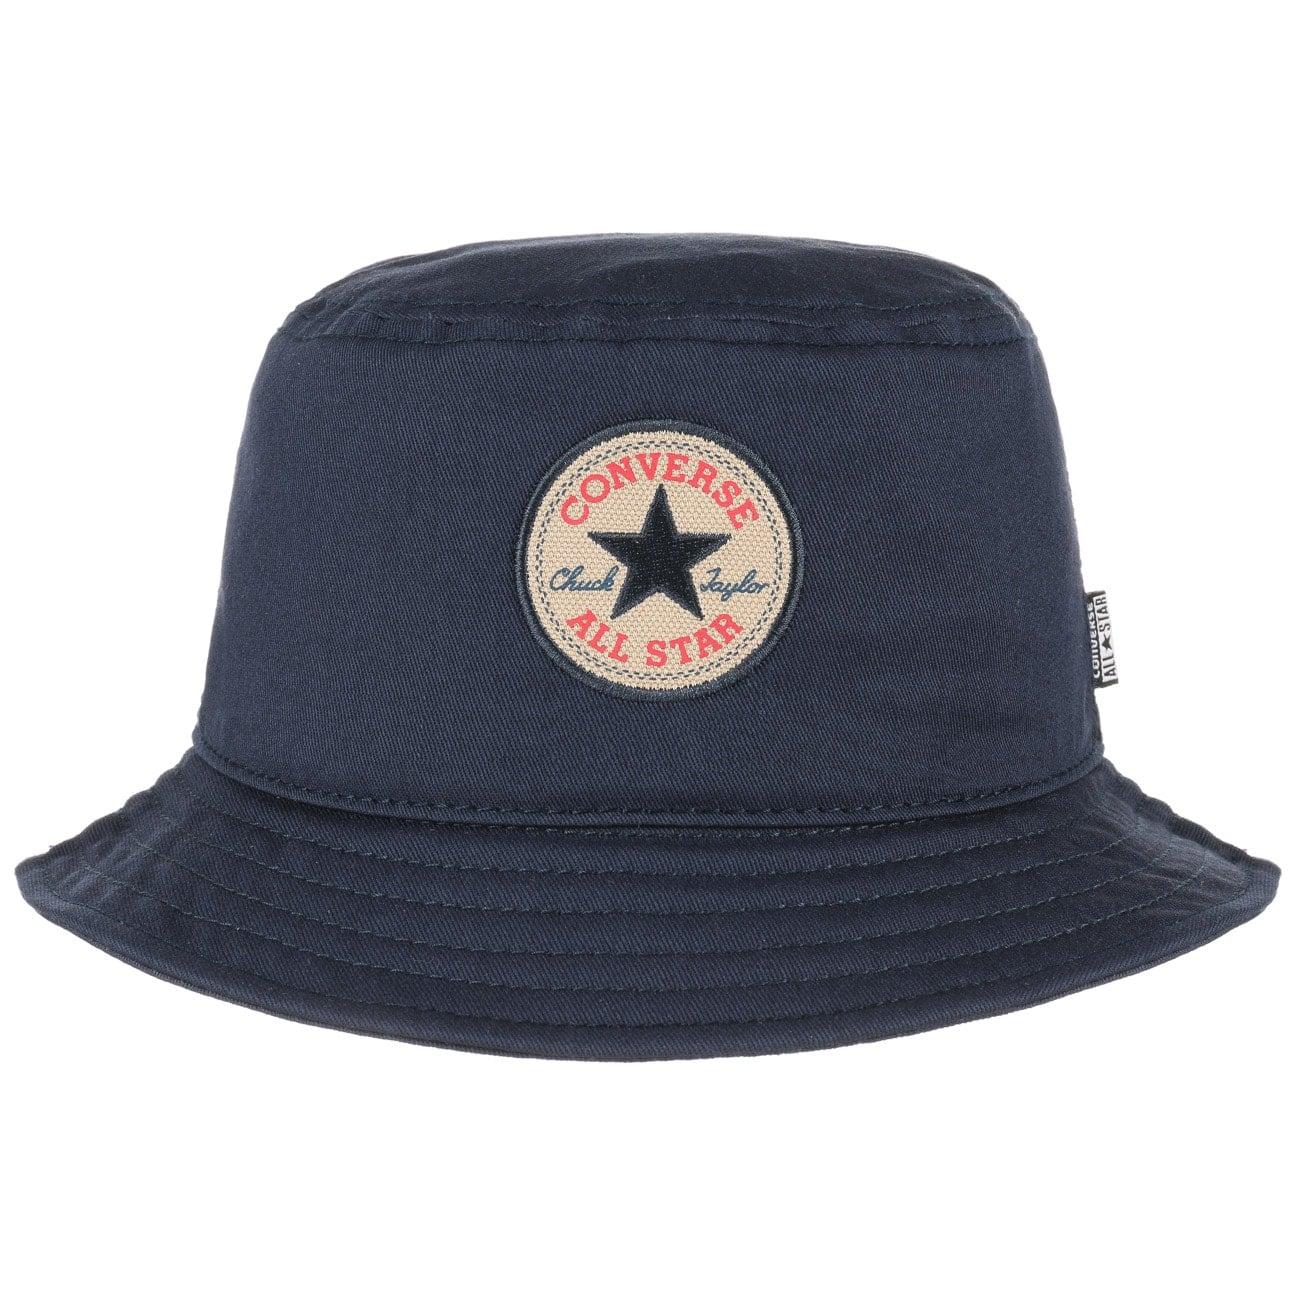 0025aca72ef7 ... Classic Bucket Hat by Converse - blue 4 ...